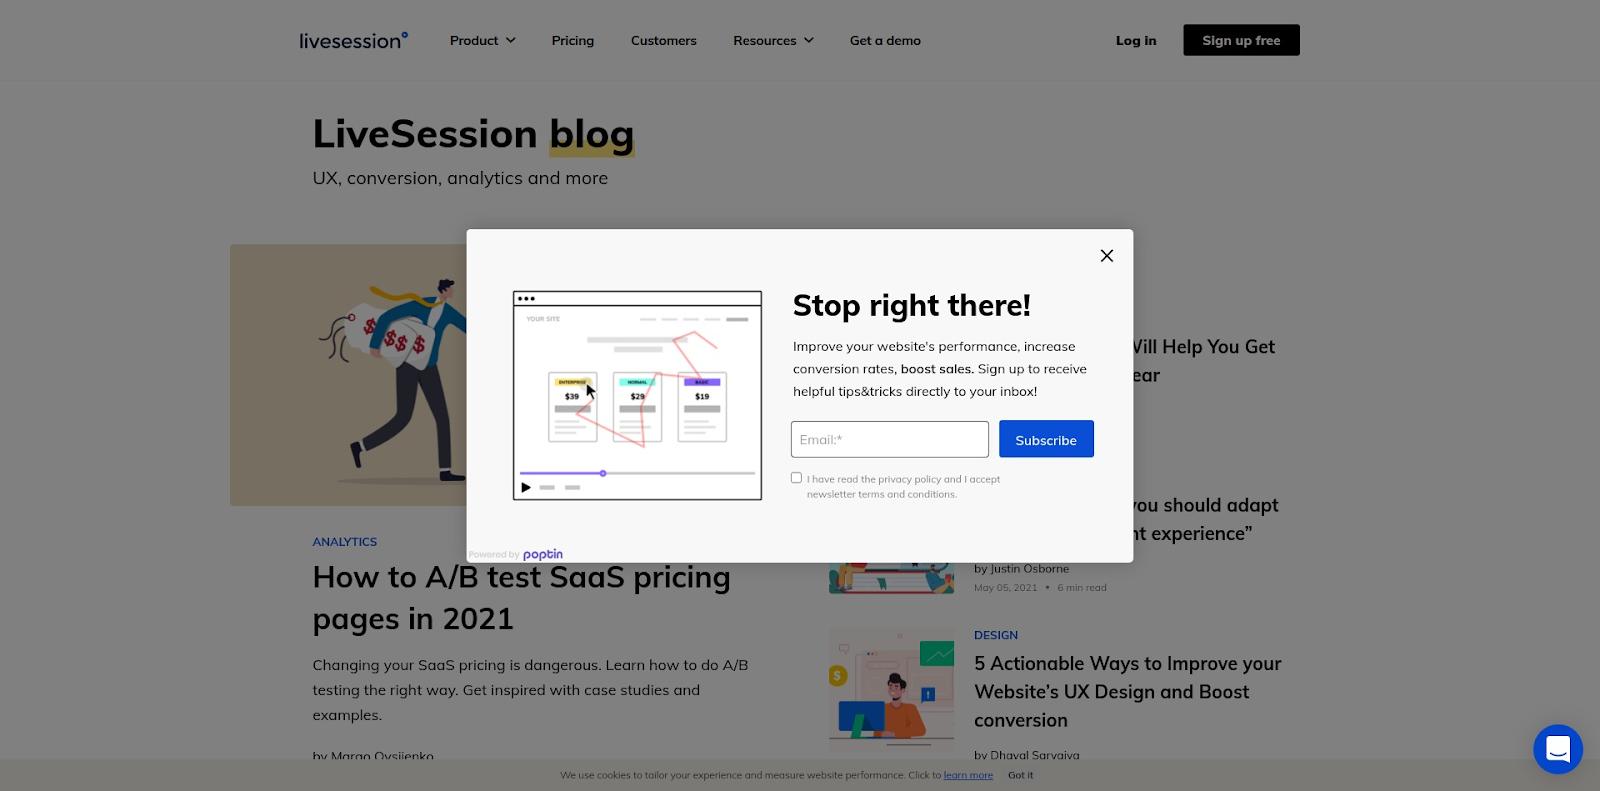 LiveSession Blog - screenshot - popup